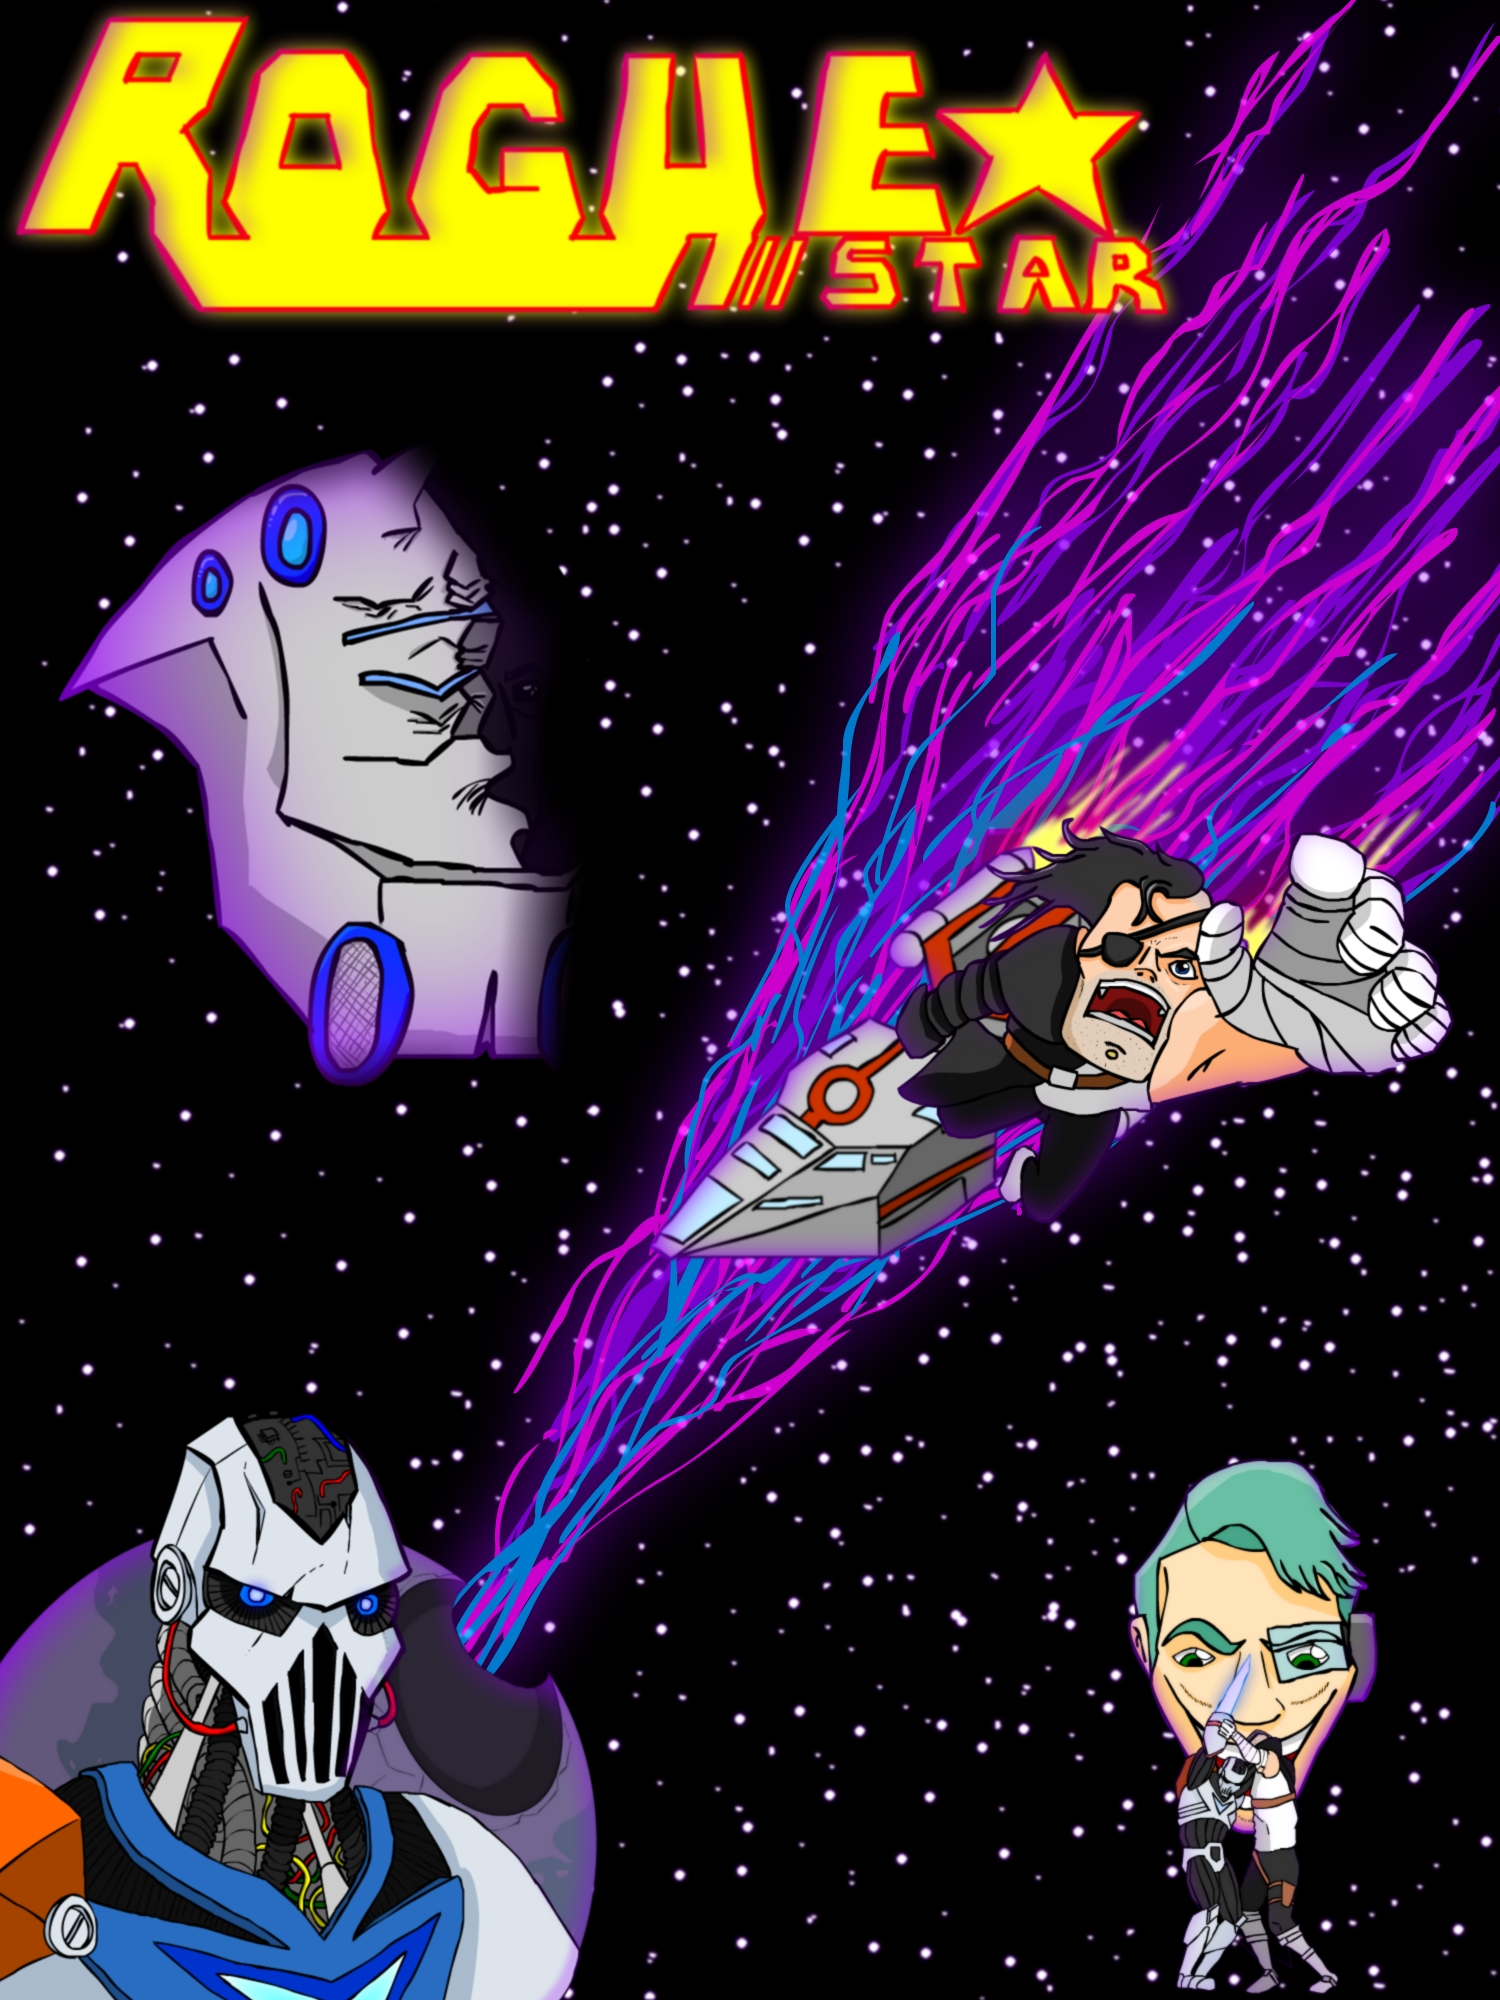 Rogue Star Space Opera